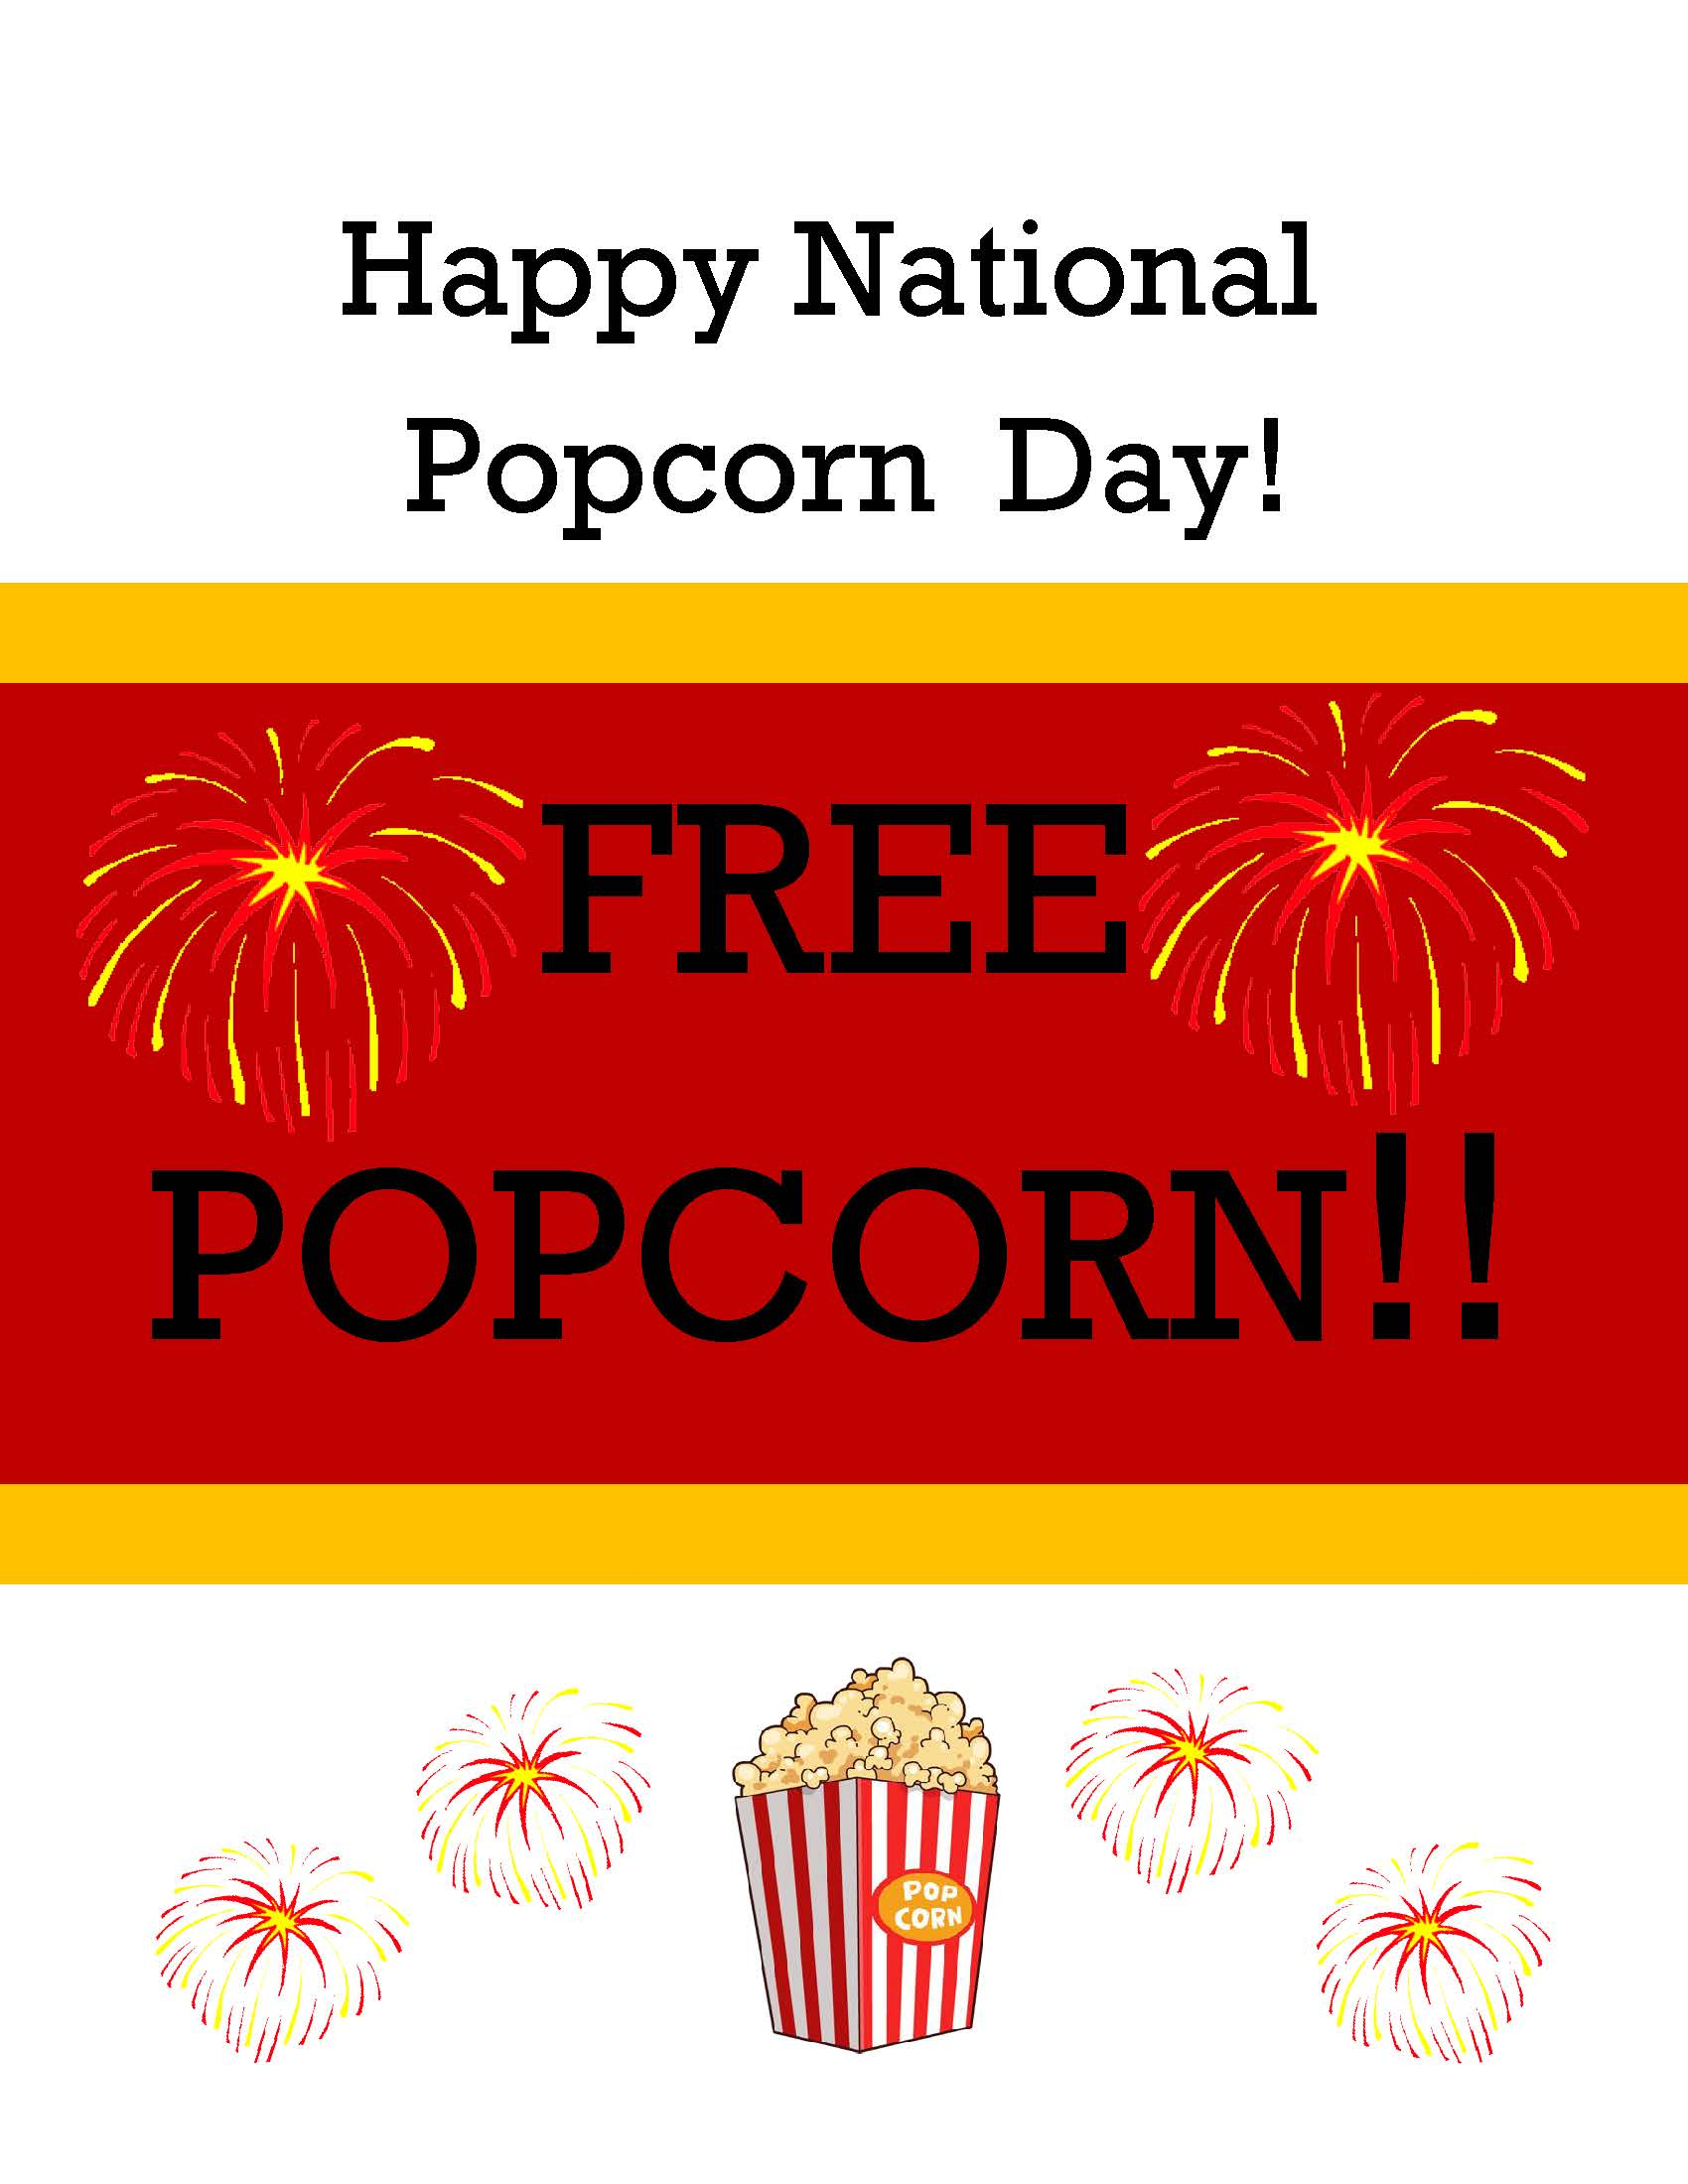 Free Popcorn Banner